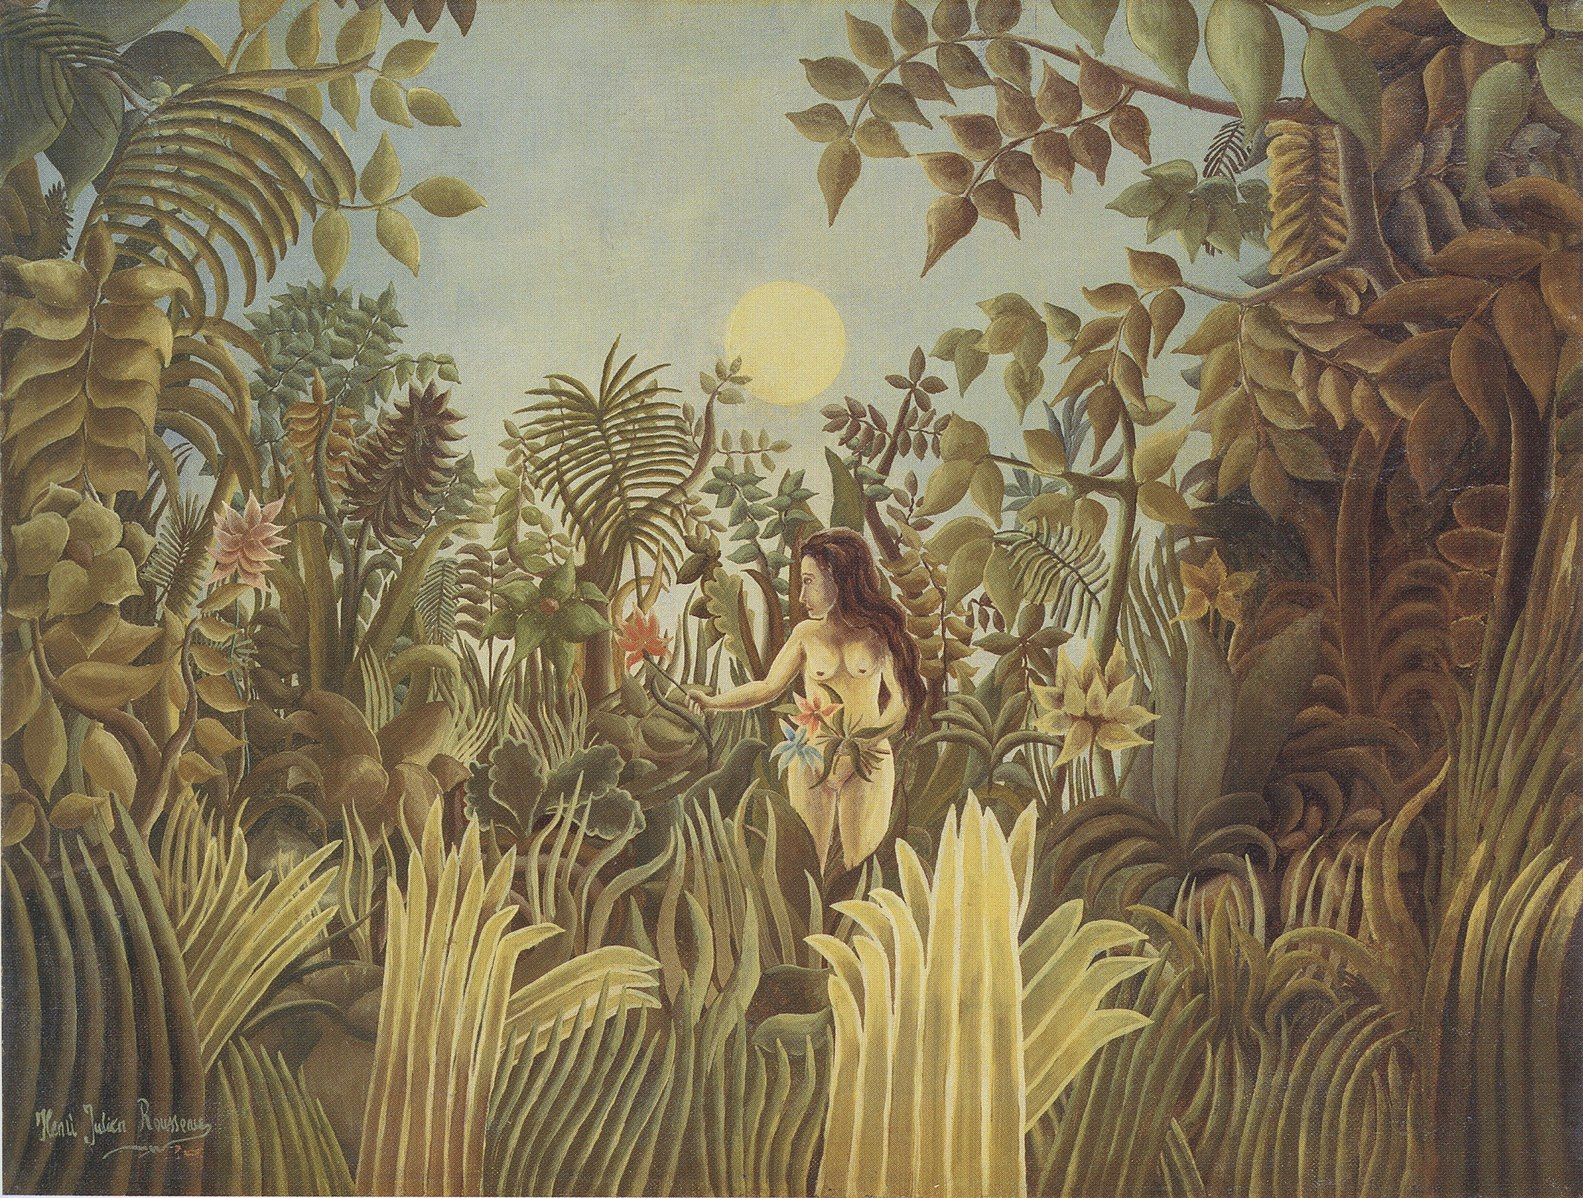 Eve In The Garden of Eden,  Henri Rousseau